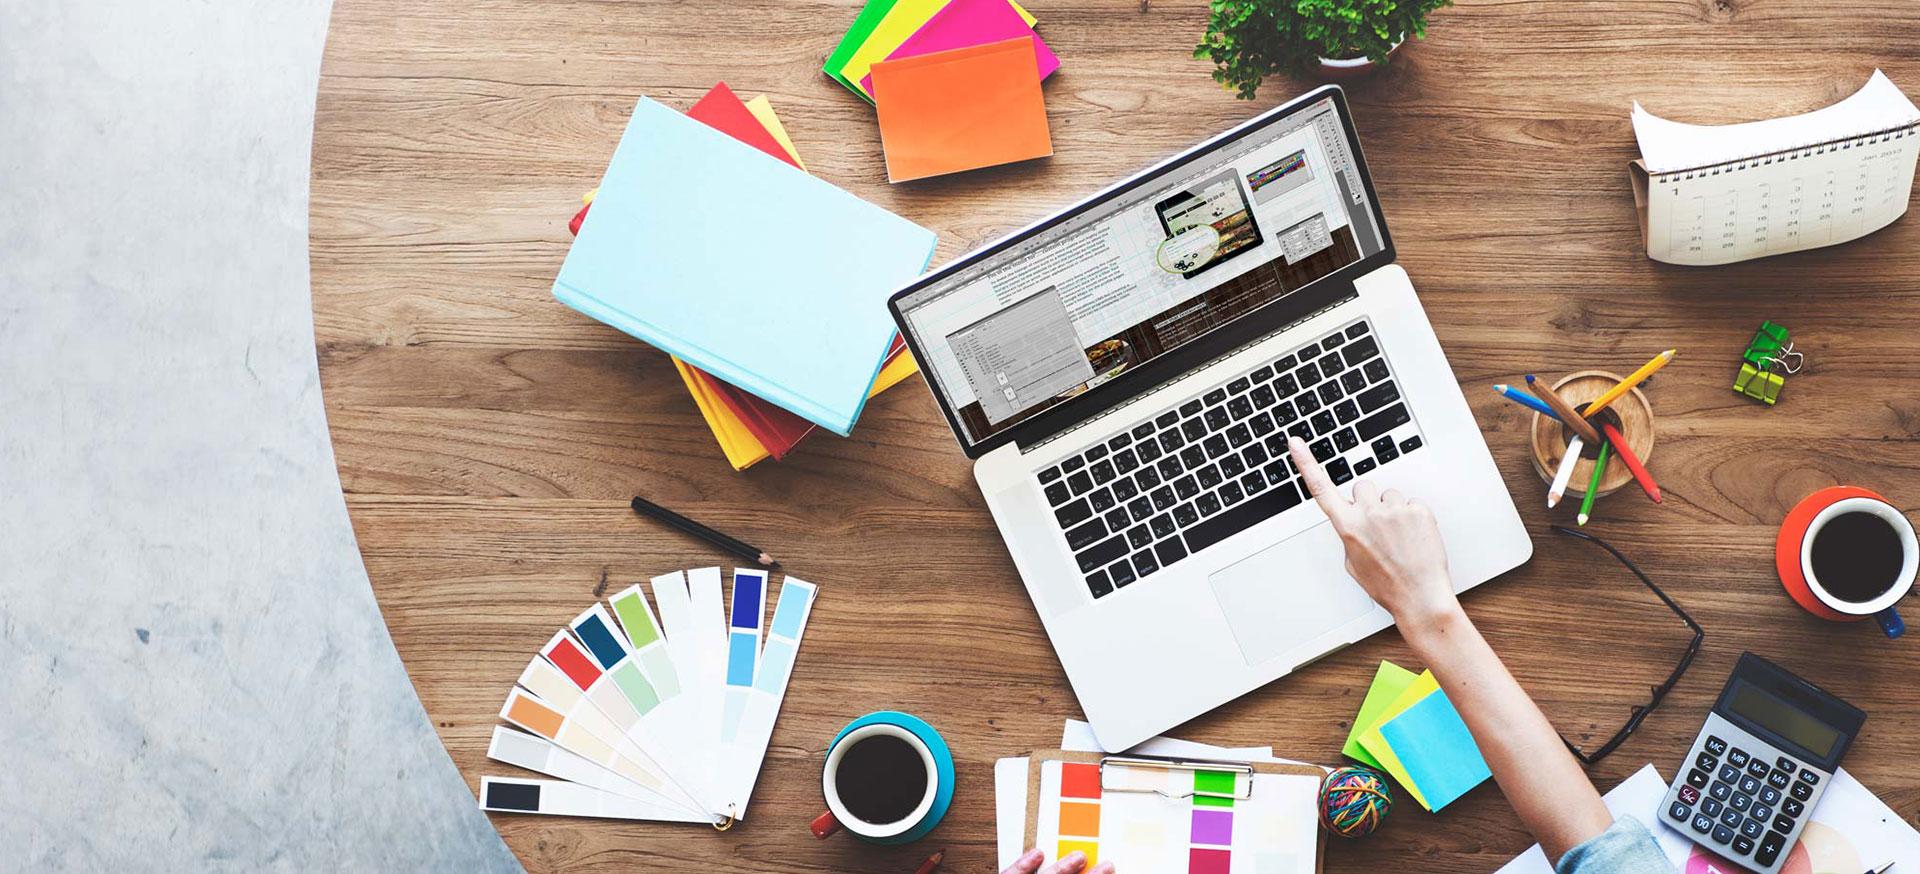 Web Designing Company Lahore Pakistan Herald Lynx